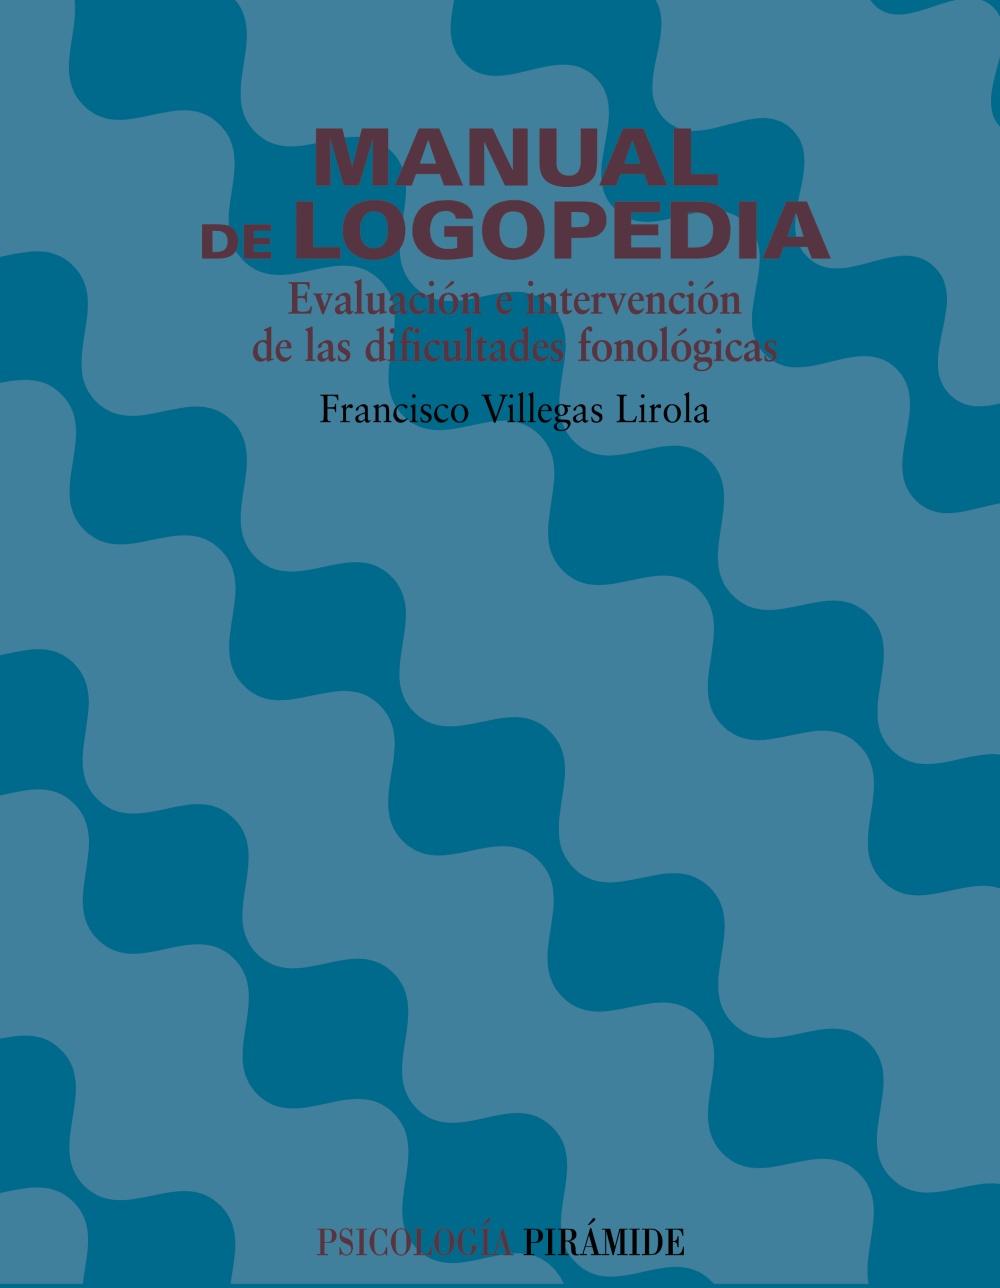 Manual De Logopedia: Evaluacion E Intervencion De Las Dificultade S Fonologicas por Francisco Villegas Lirola